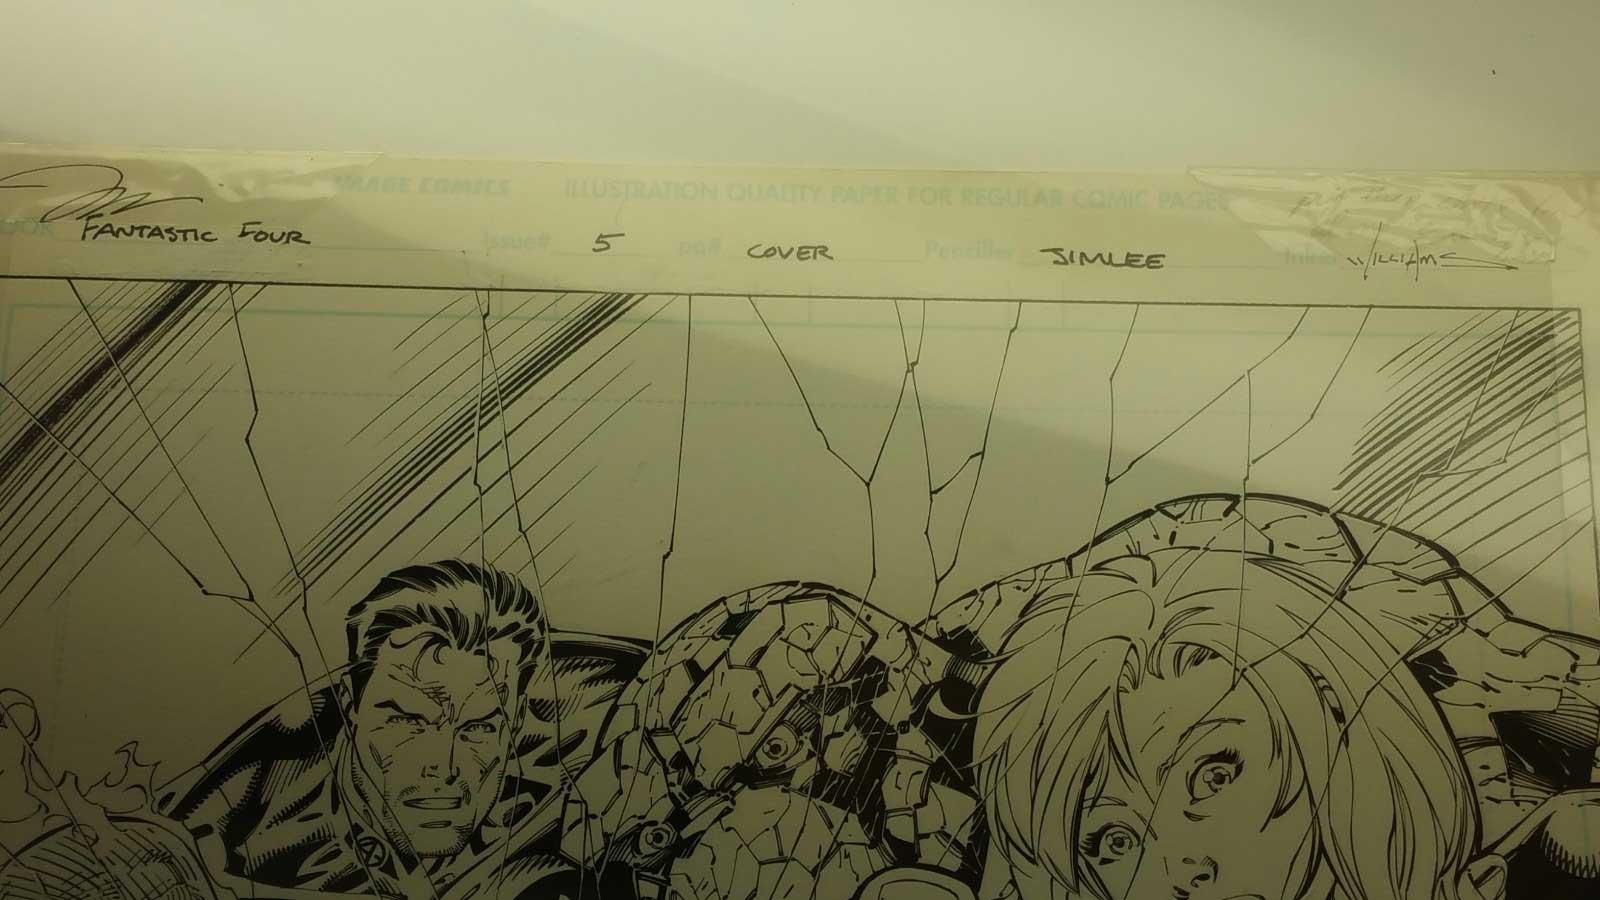 nyc-comiccon-jim-lee-fantastic-four-art-2